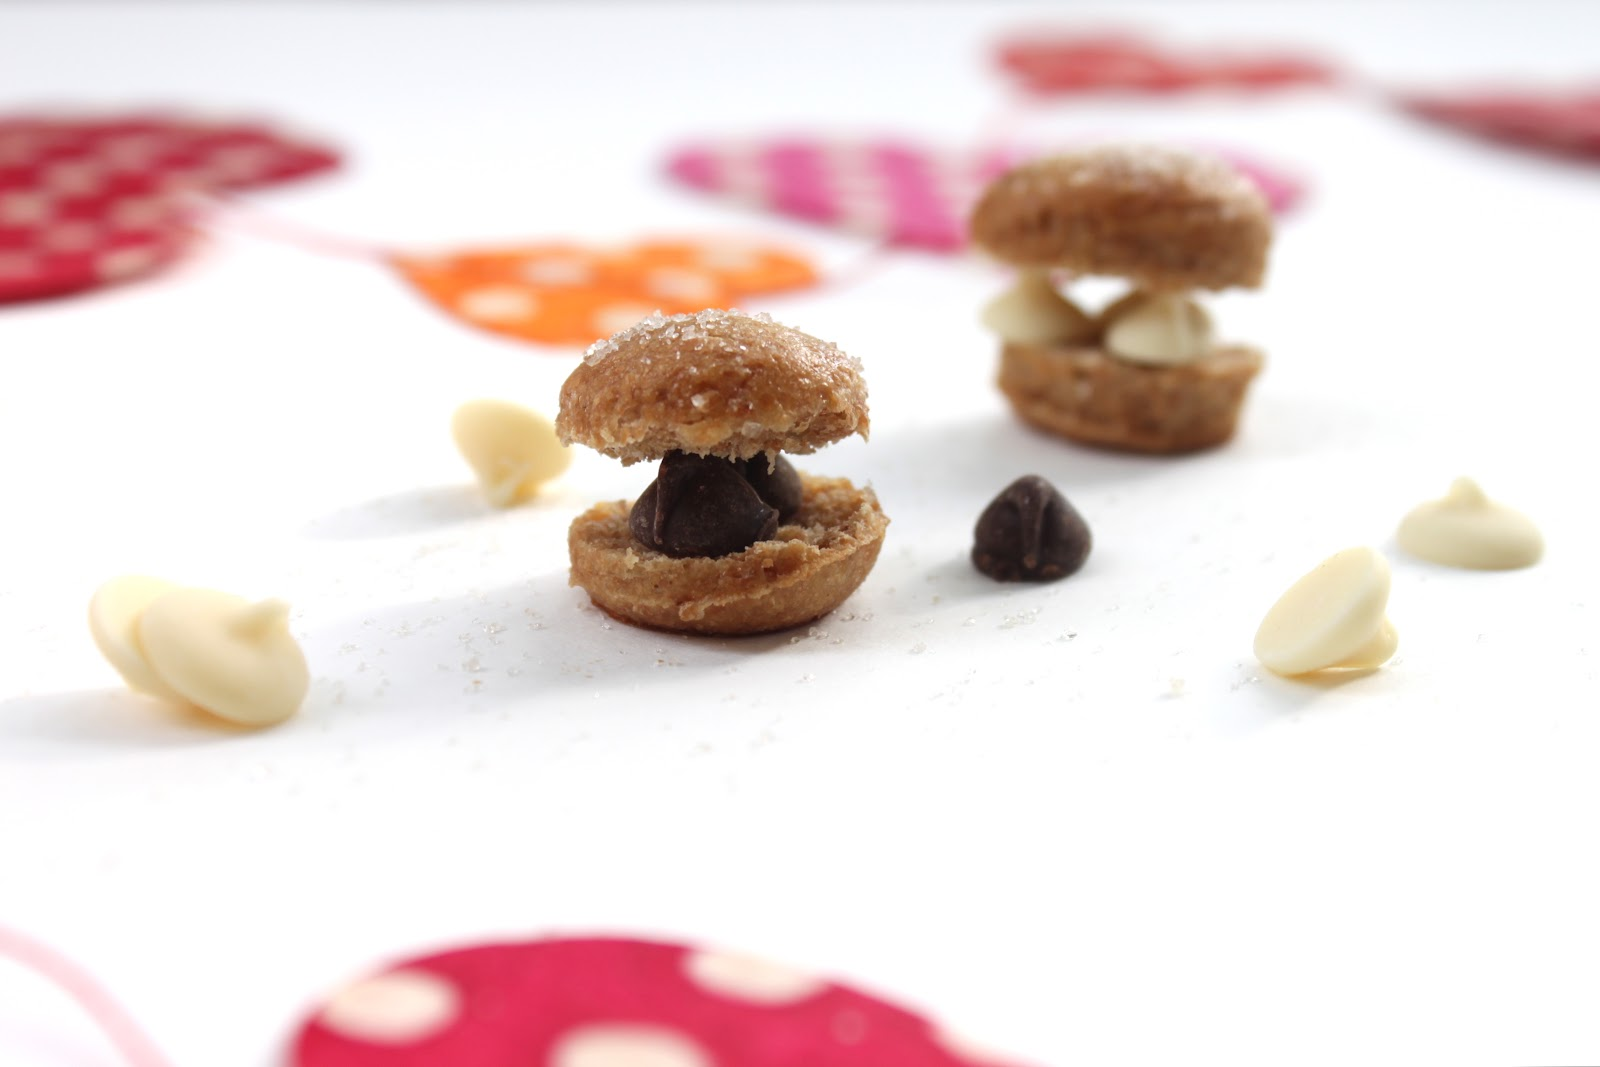 Petits repas entre amis donuts en p te beignets for Petit repas entre amis